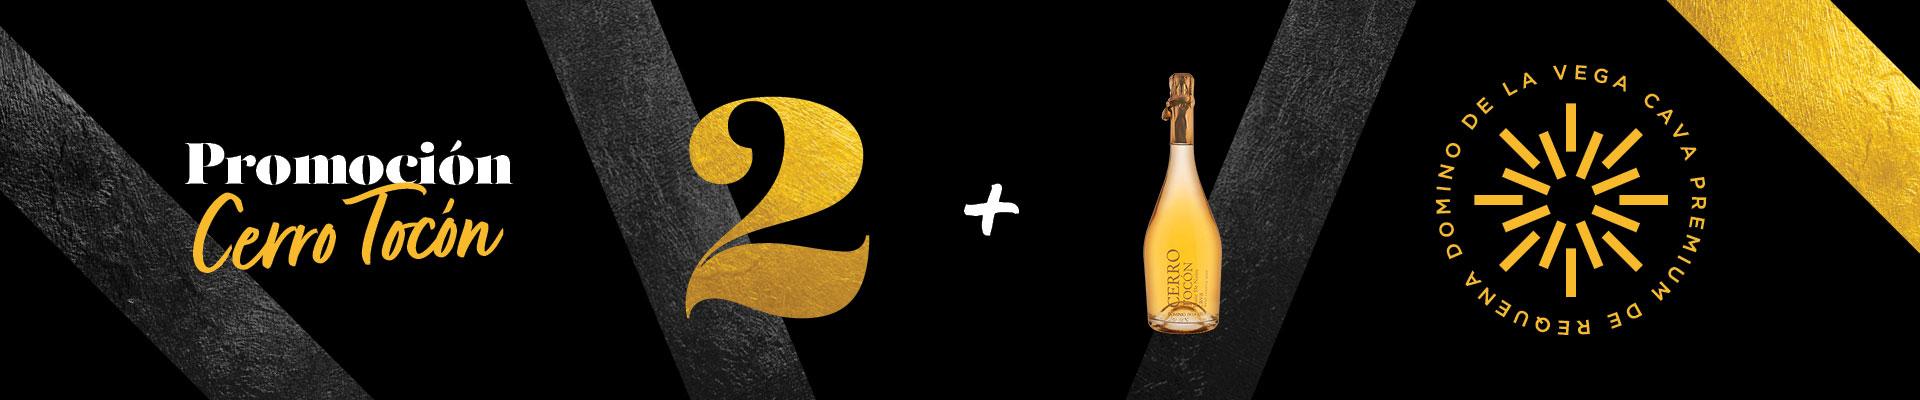 Promoción Cava Blanc de noirs: 2 + 1